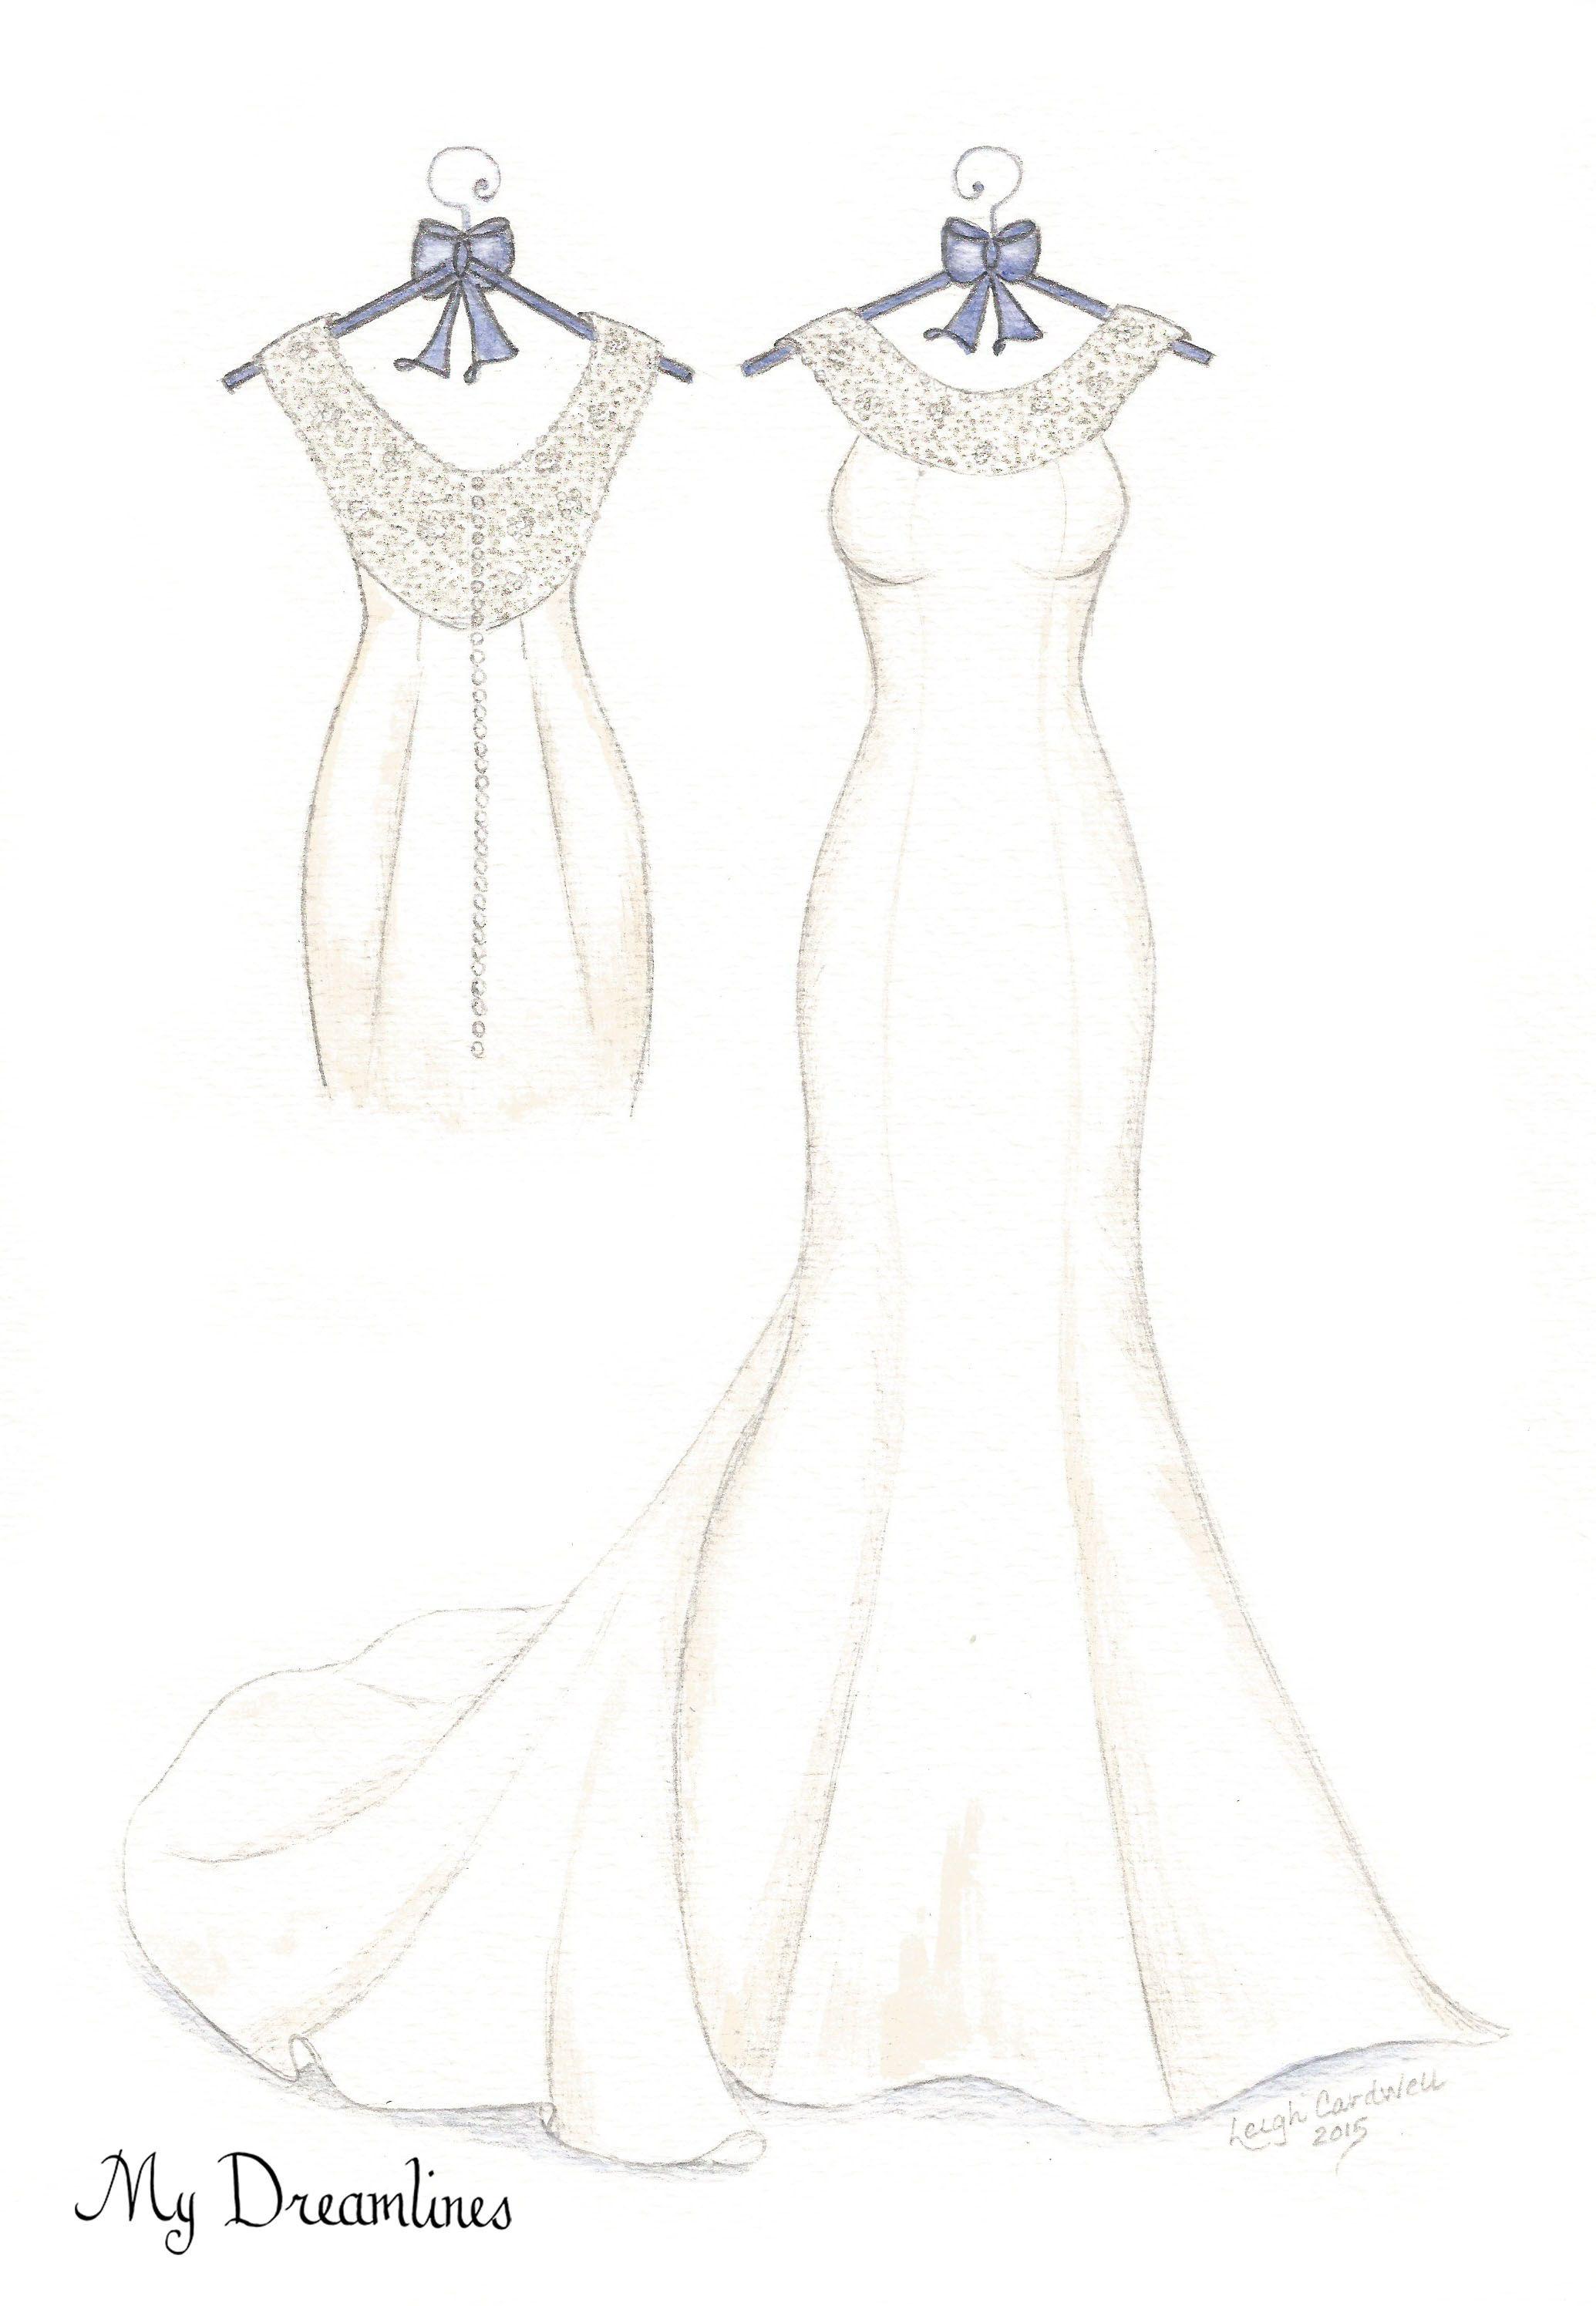 Dreamlines Wedding Dress Sketch give as an anniversary gift, wedding ...